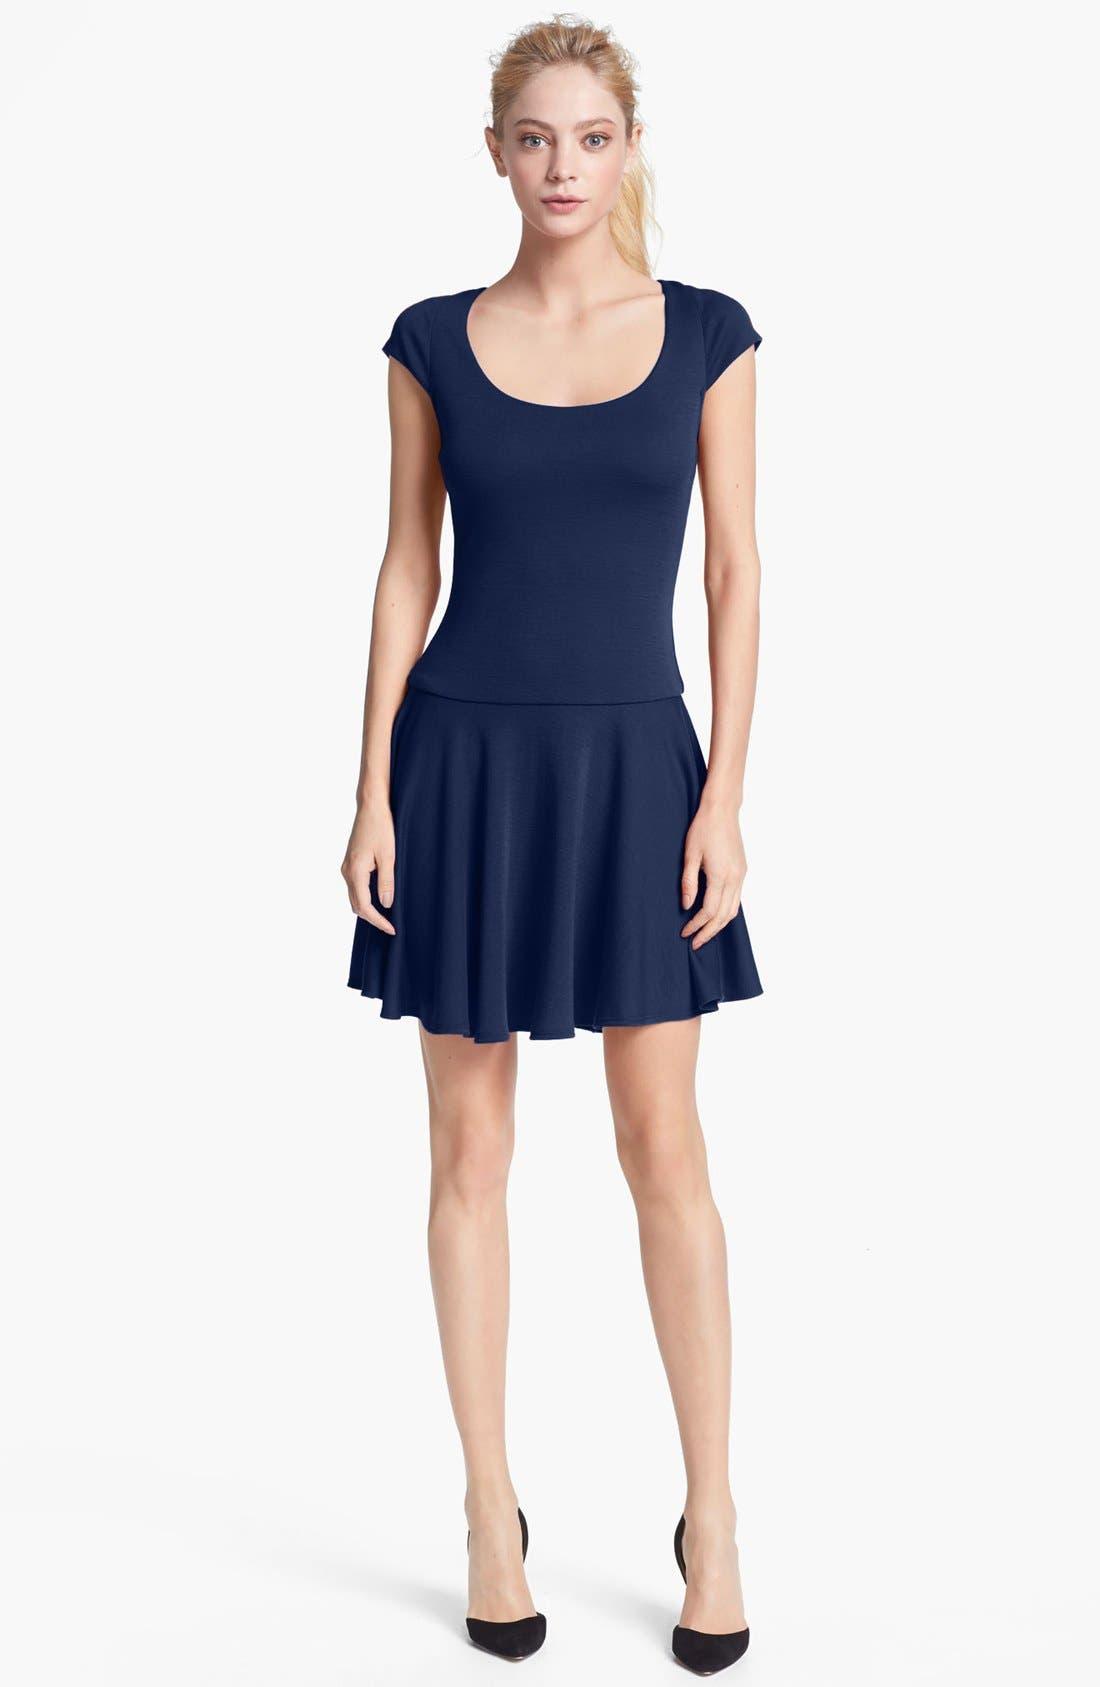 Alternate Image 1 Selected - Alice + Olivia 'Rylie' Fit & Flare Dress